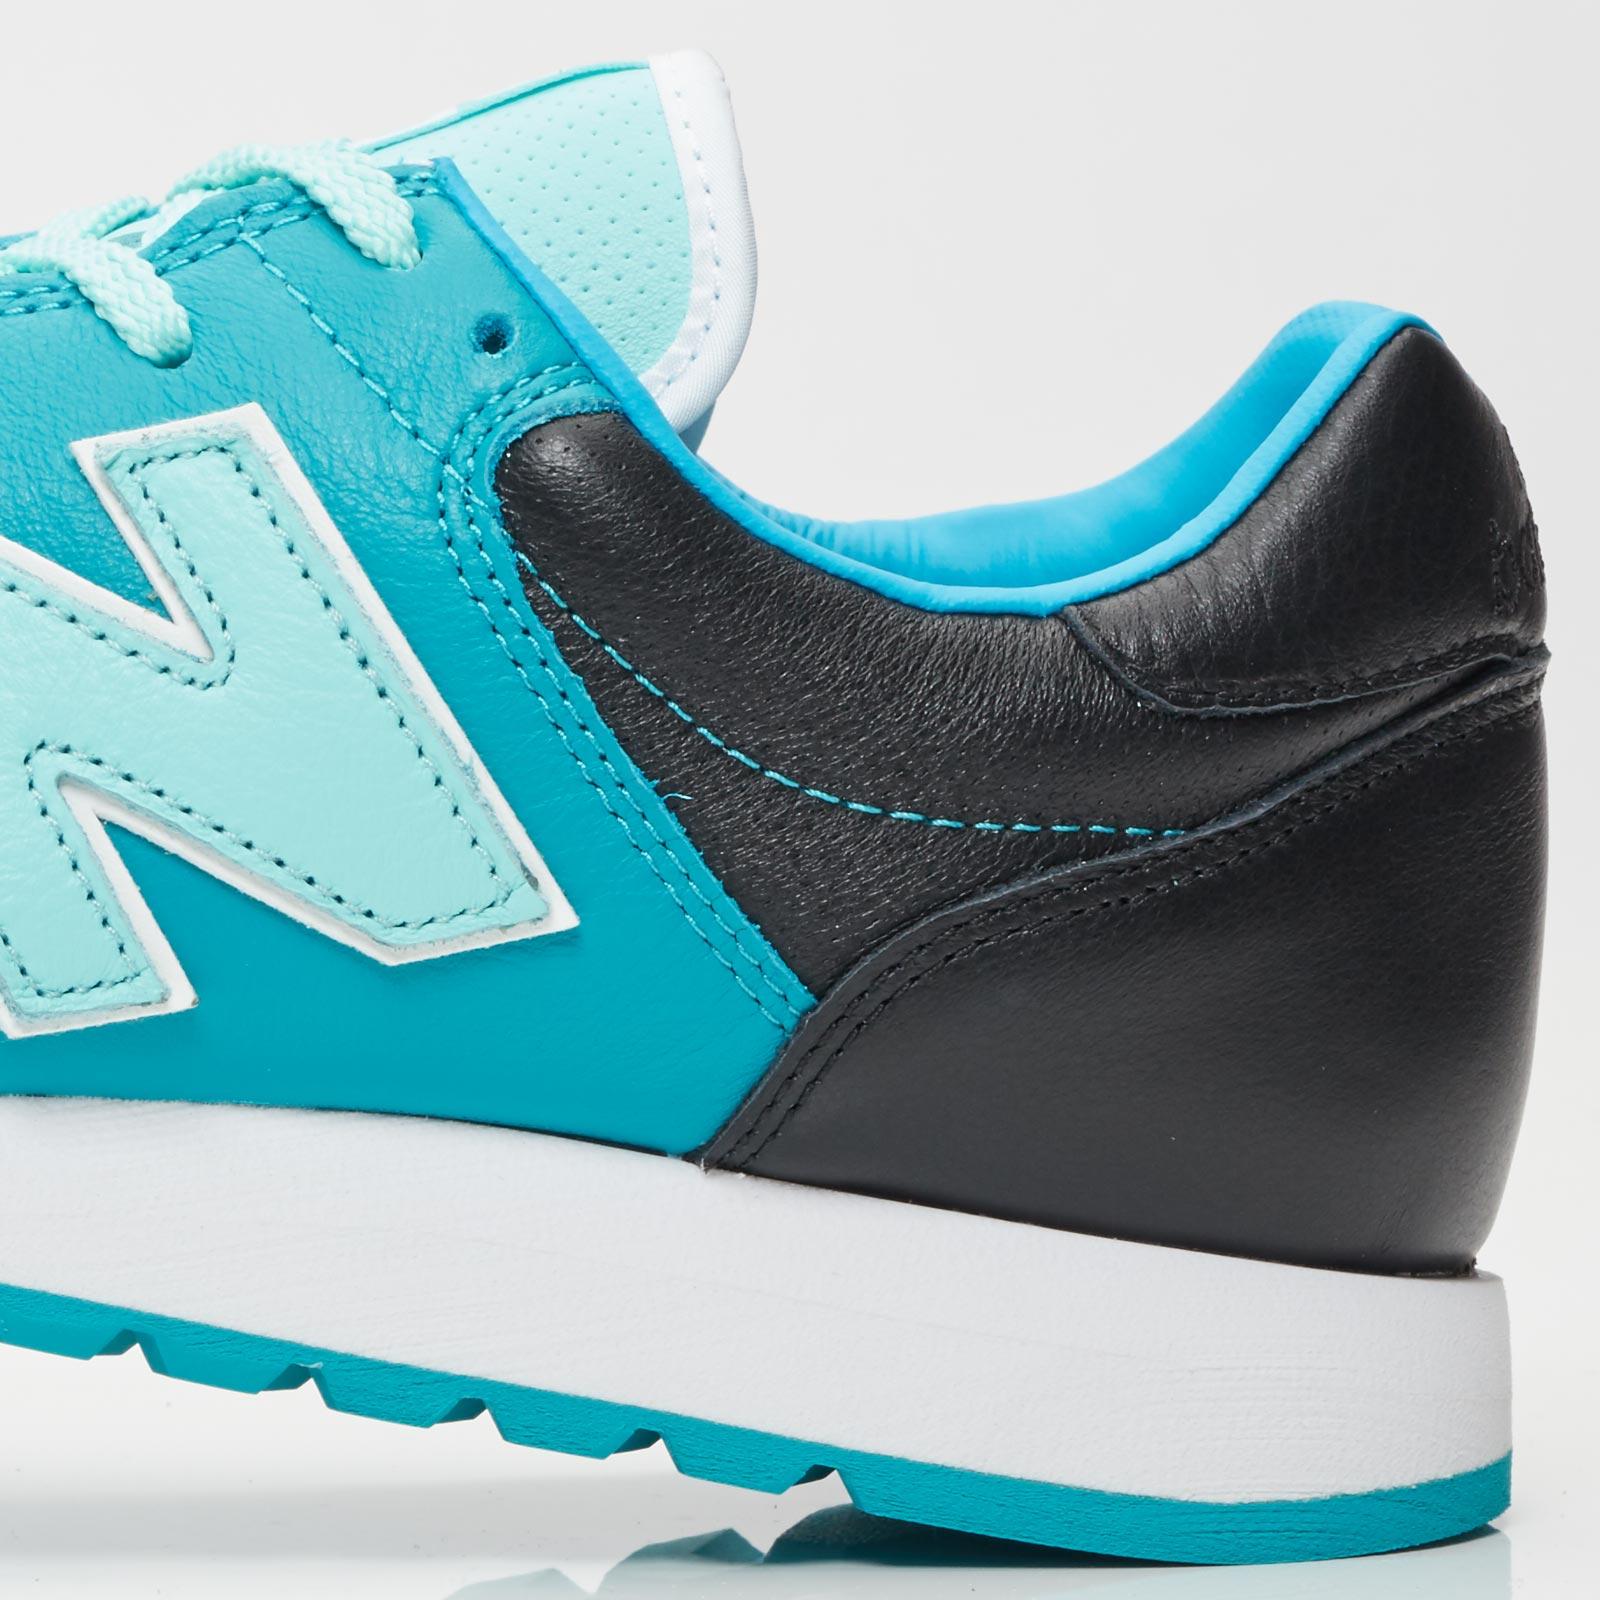 a3ad84ccf4c New Balance U520 x Hanon - U520hnf - Sneakersnstuff